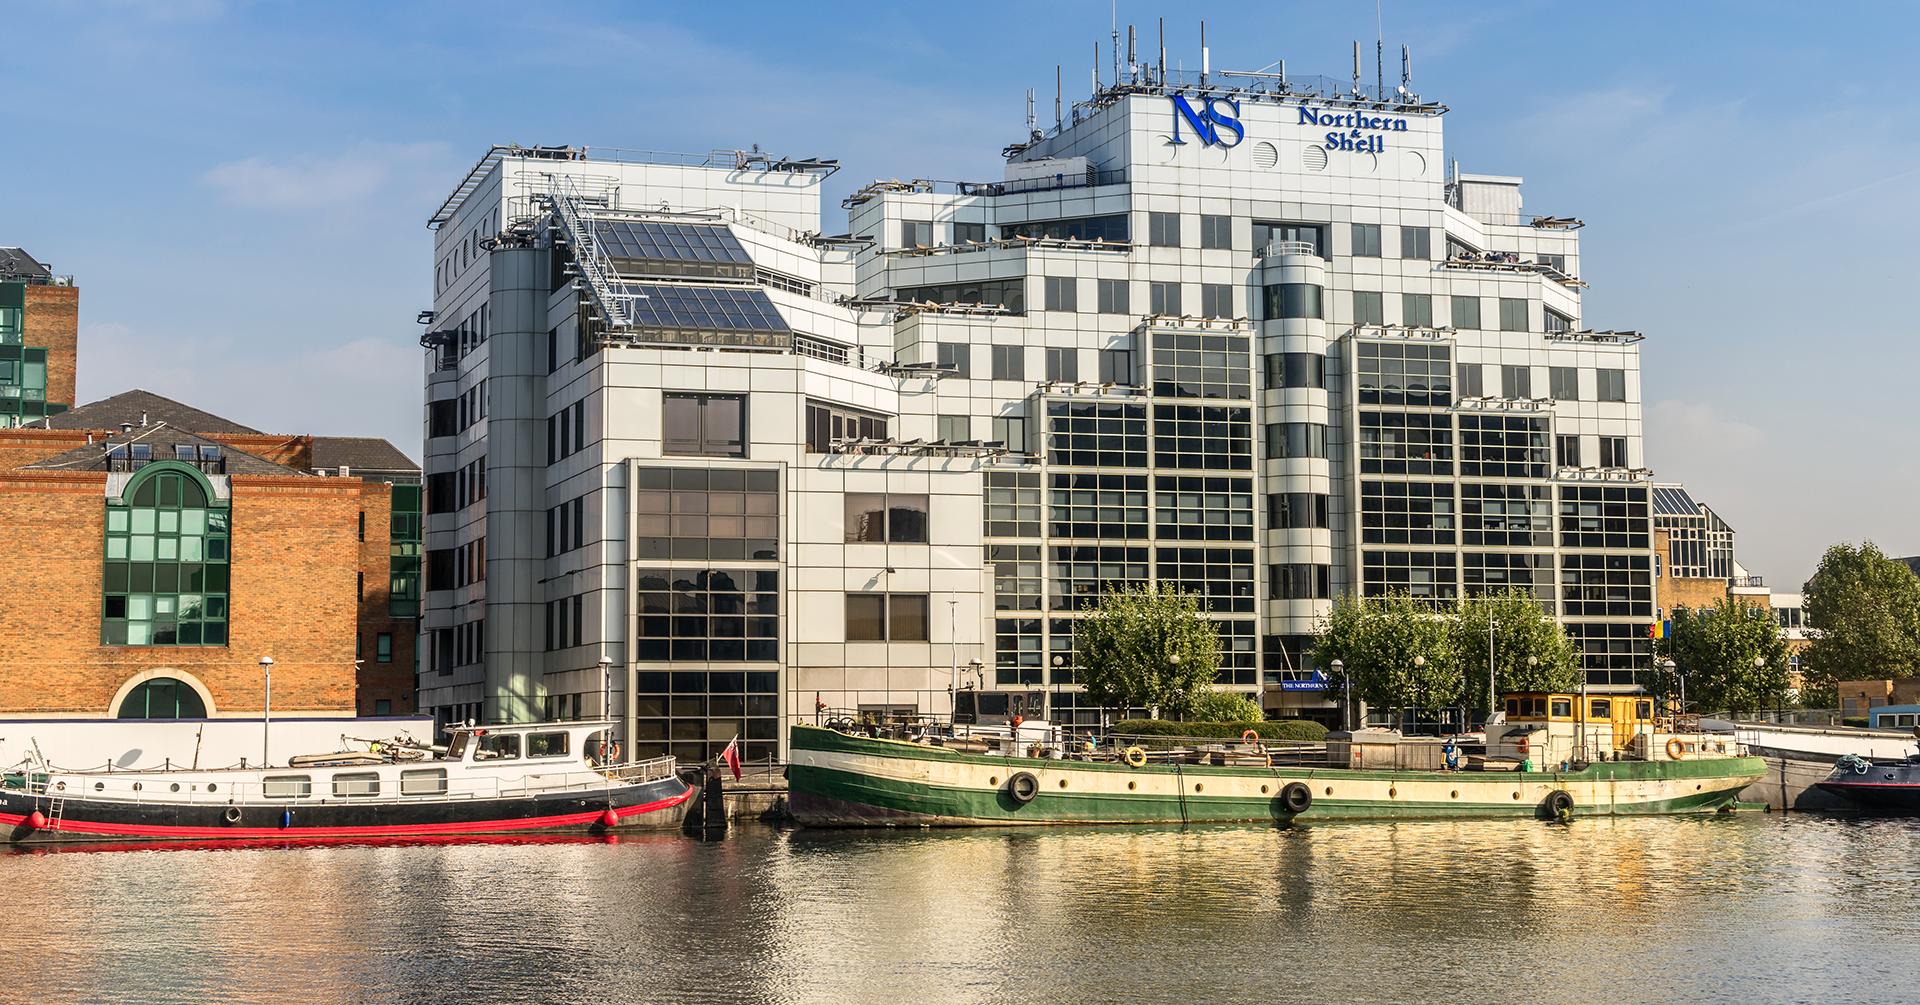 NC IUL - Italian University in London